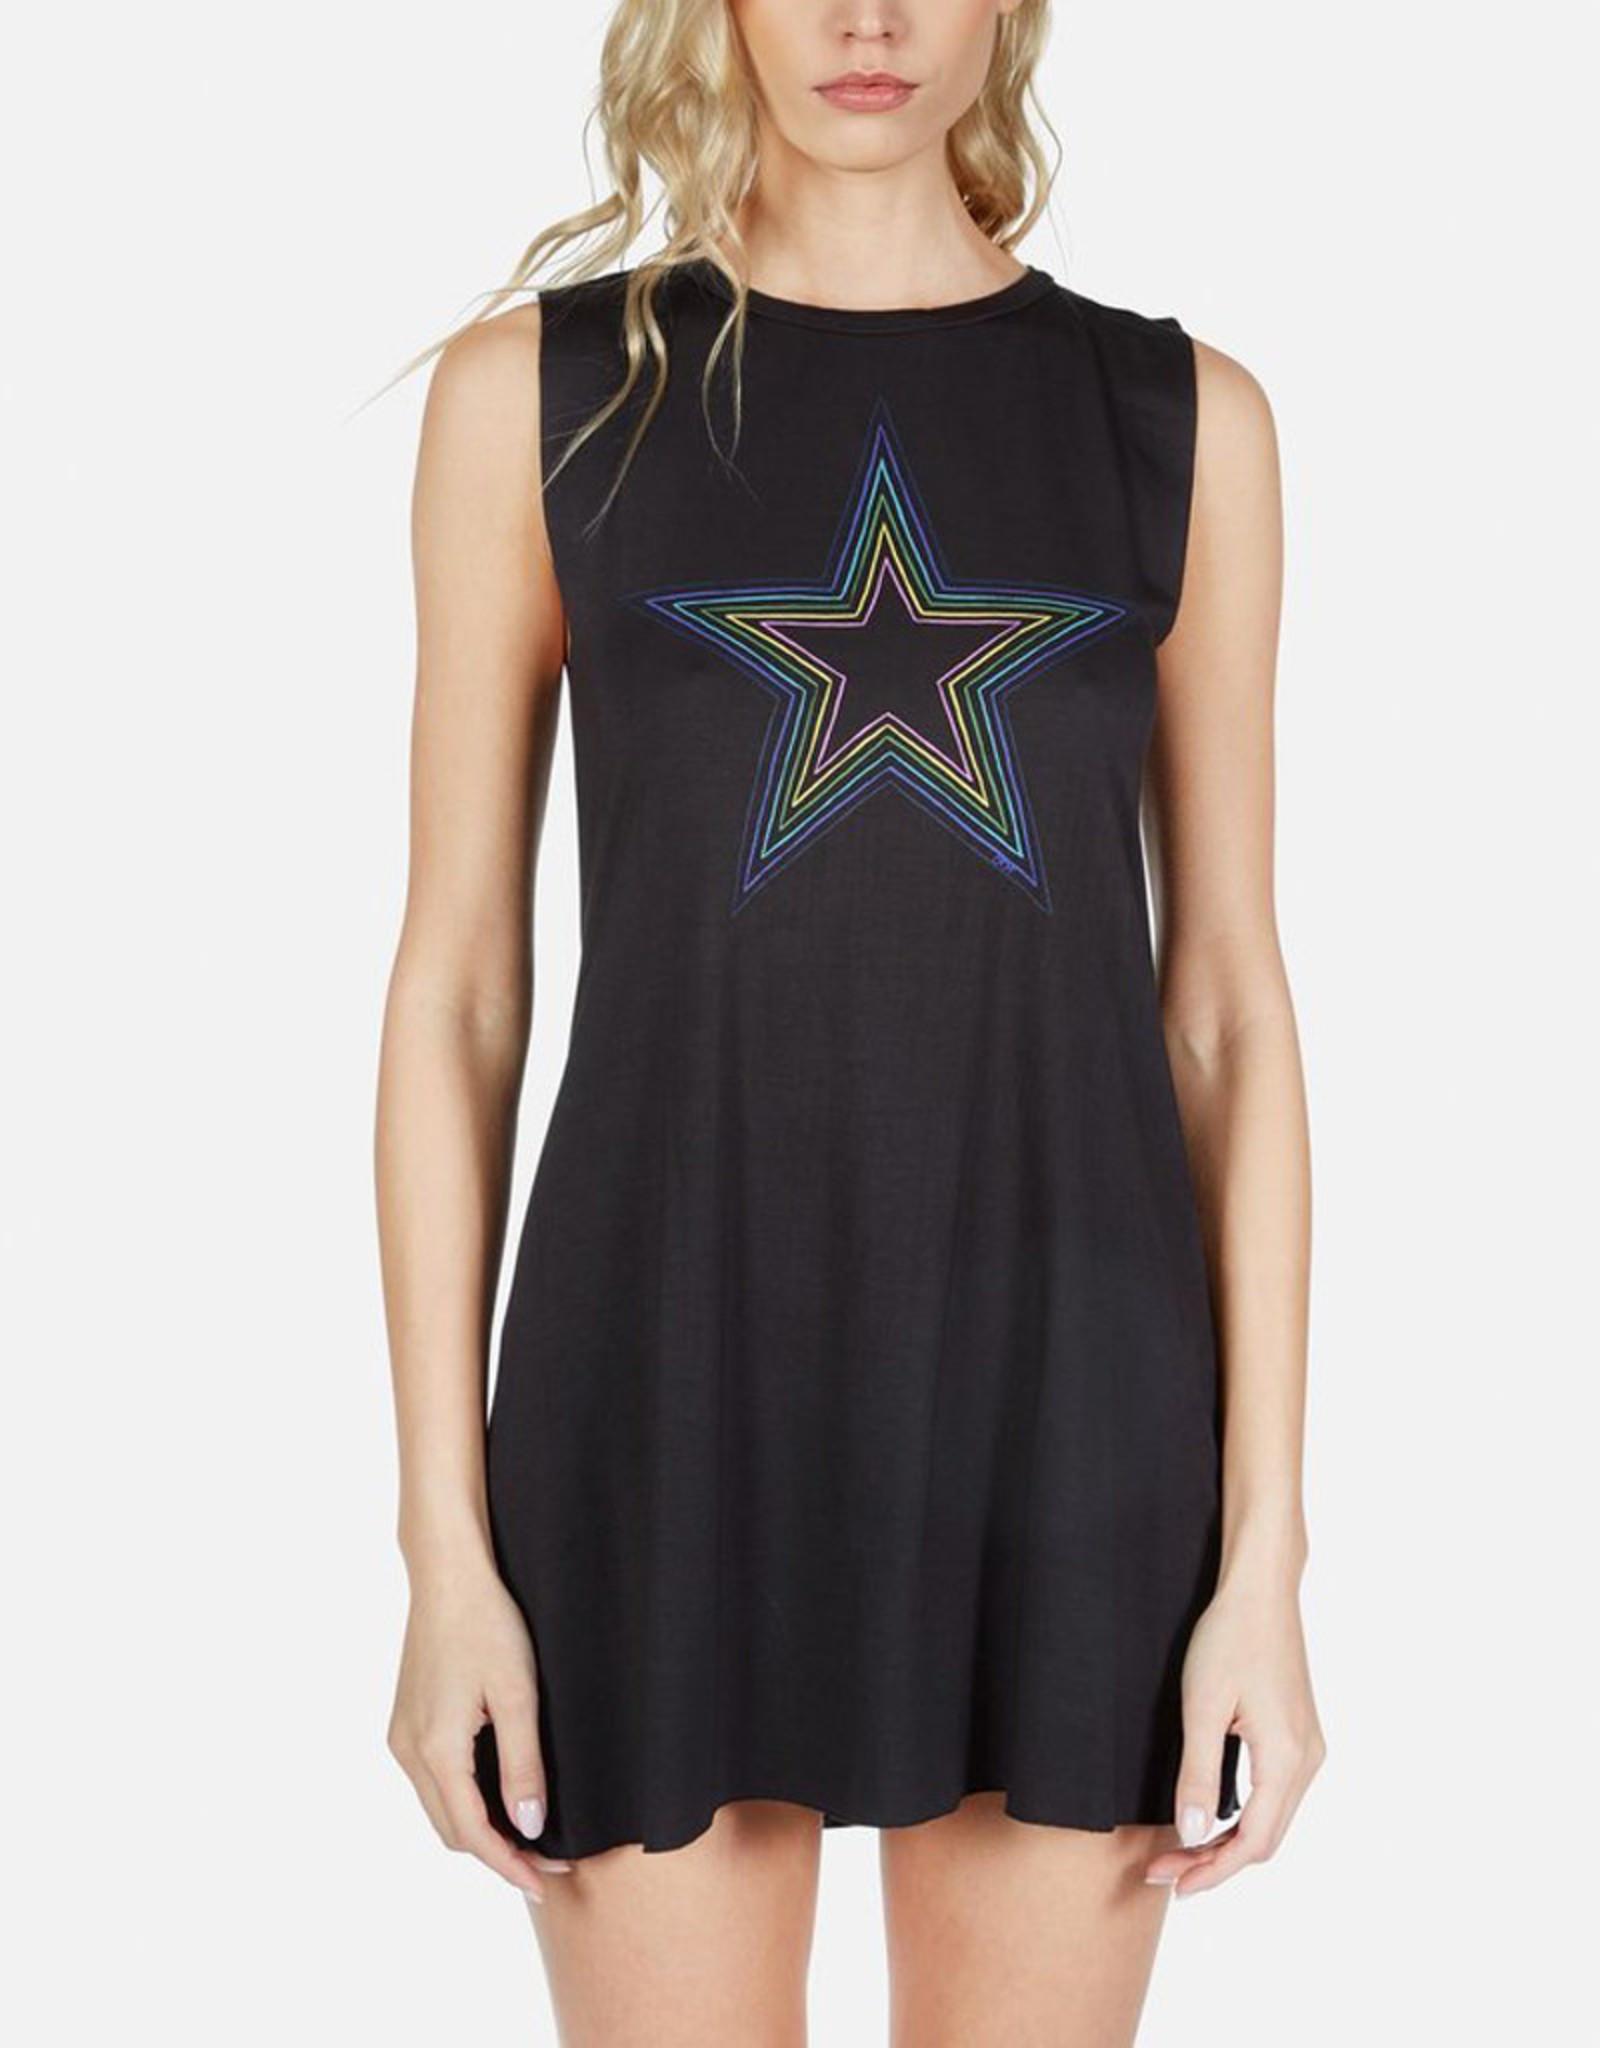 LAUREN MOSHI DEANNA RAINBOW STAR OUTLINE DRESS